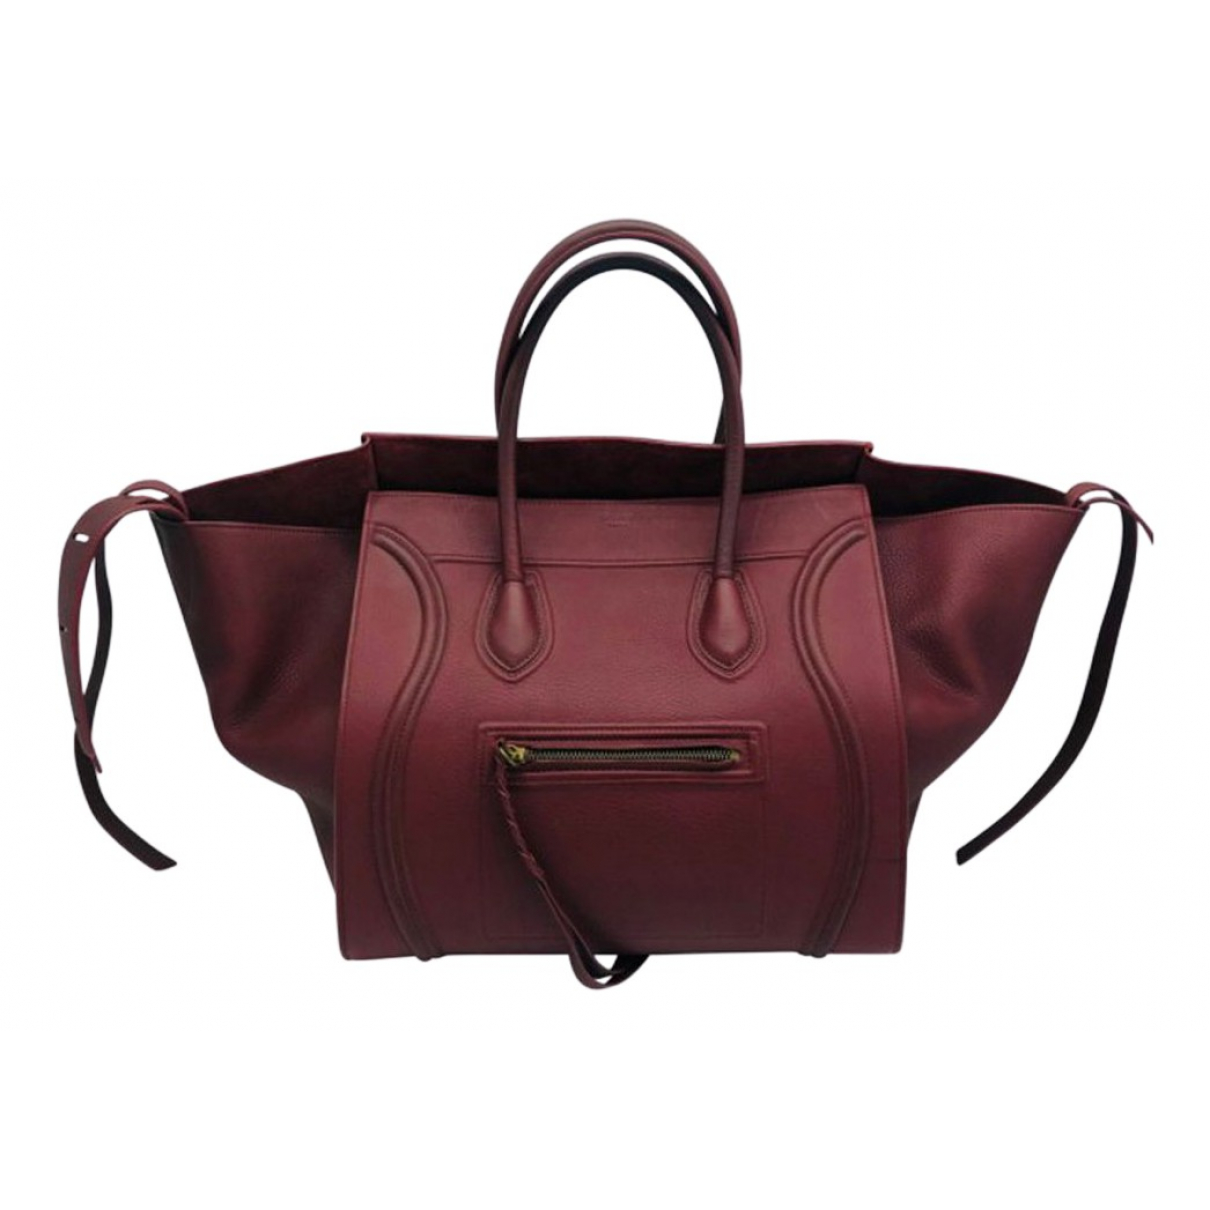 Celine Luggage Phantom Red Leather handbag for Women \N